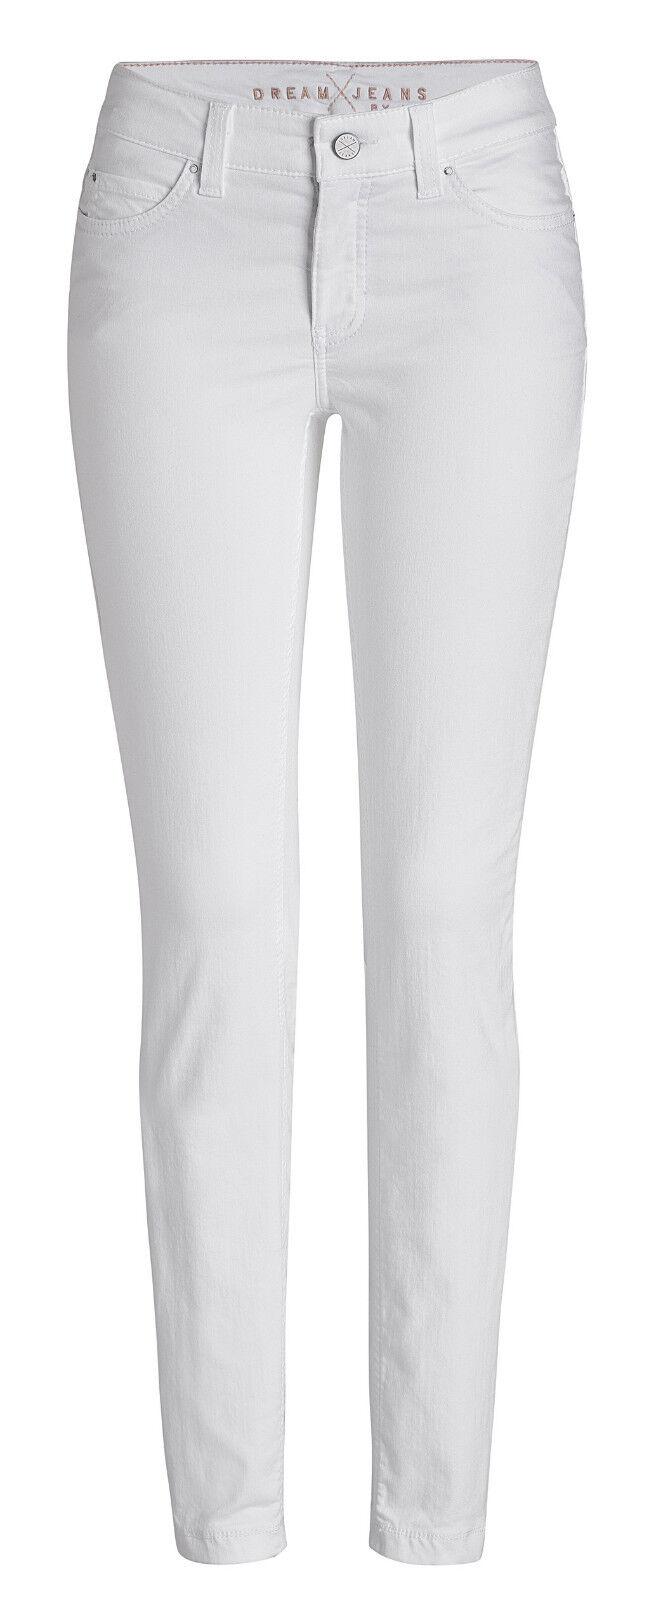 MAC Damen Jeans Dream Skinny 5402 Weiß denim D010 Alle Größen Längen